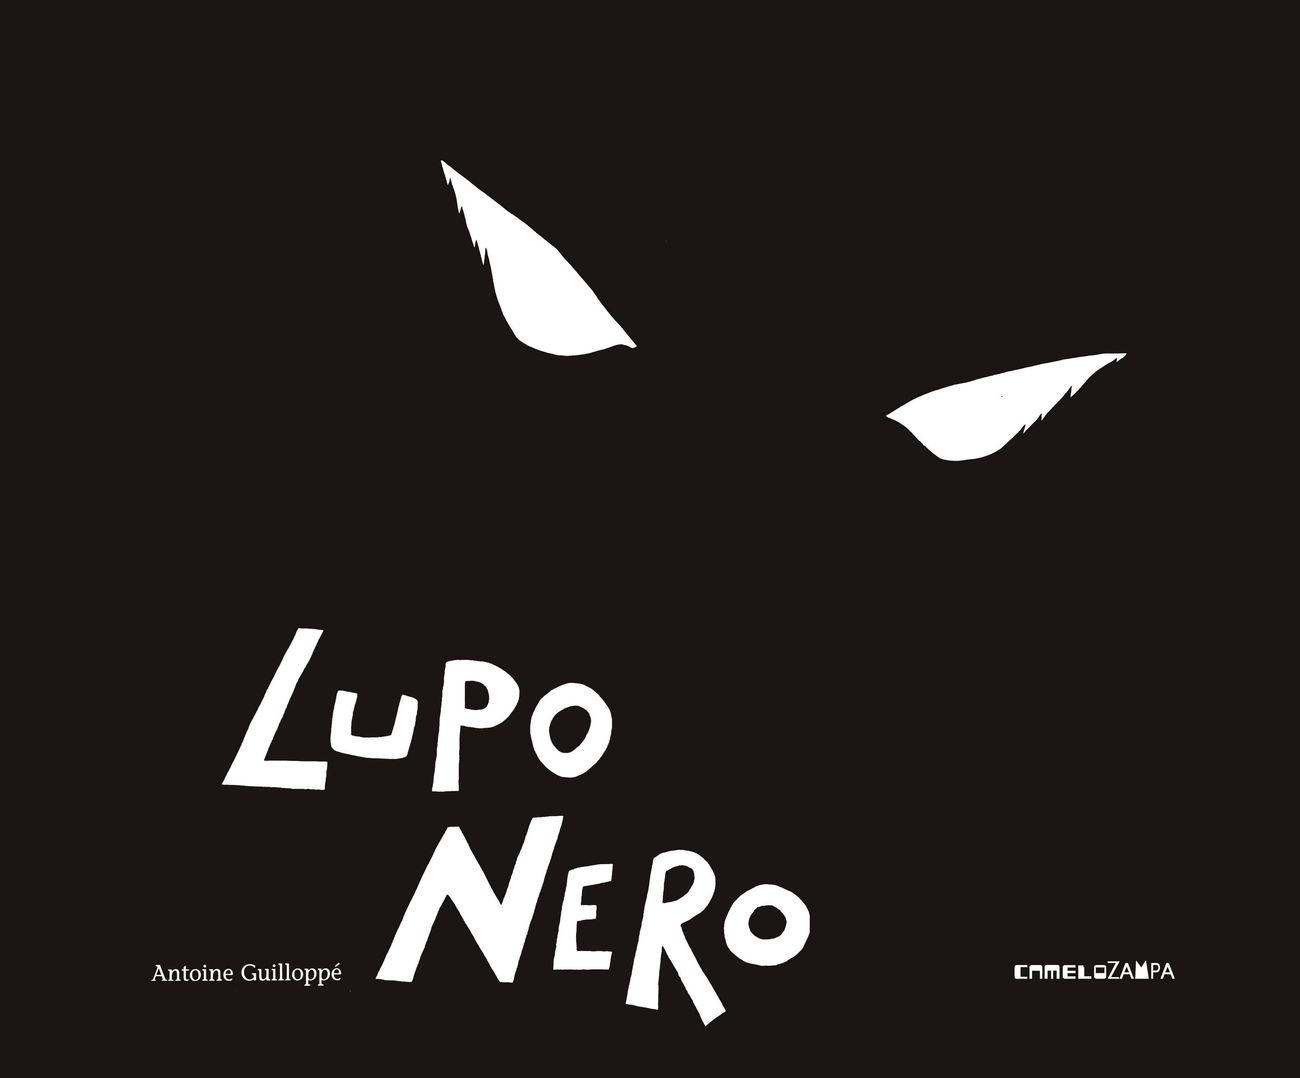 Antoine Guilloppé – Lupo nero (Camelozampa, Monselice 2021)